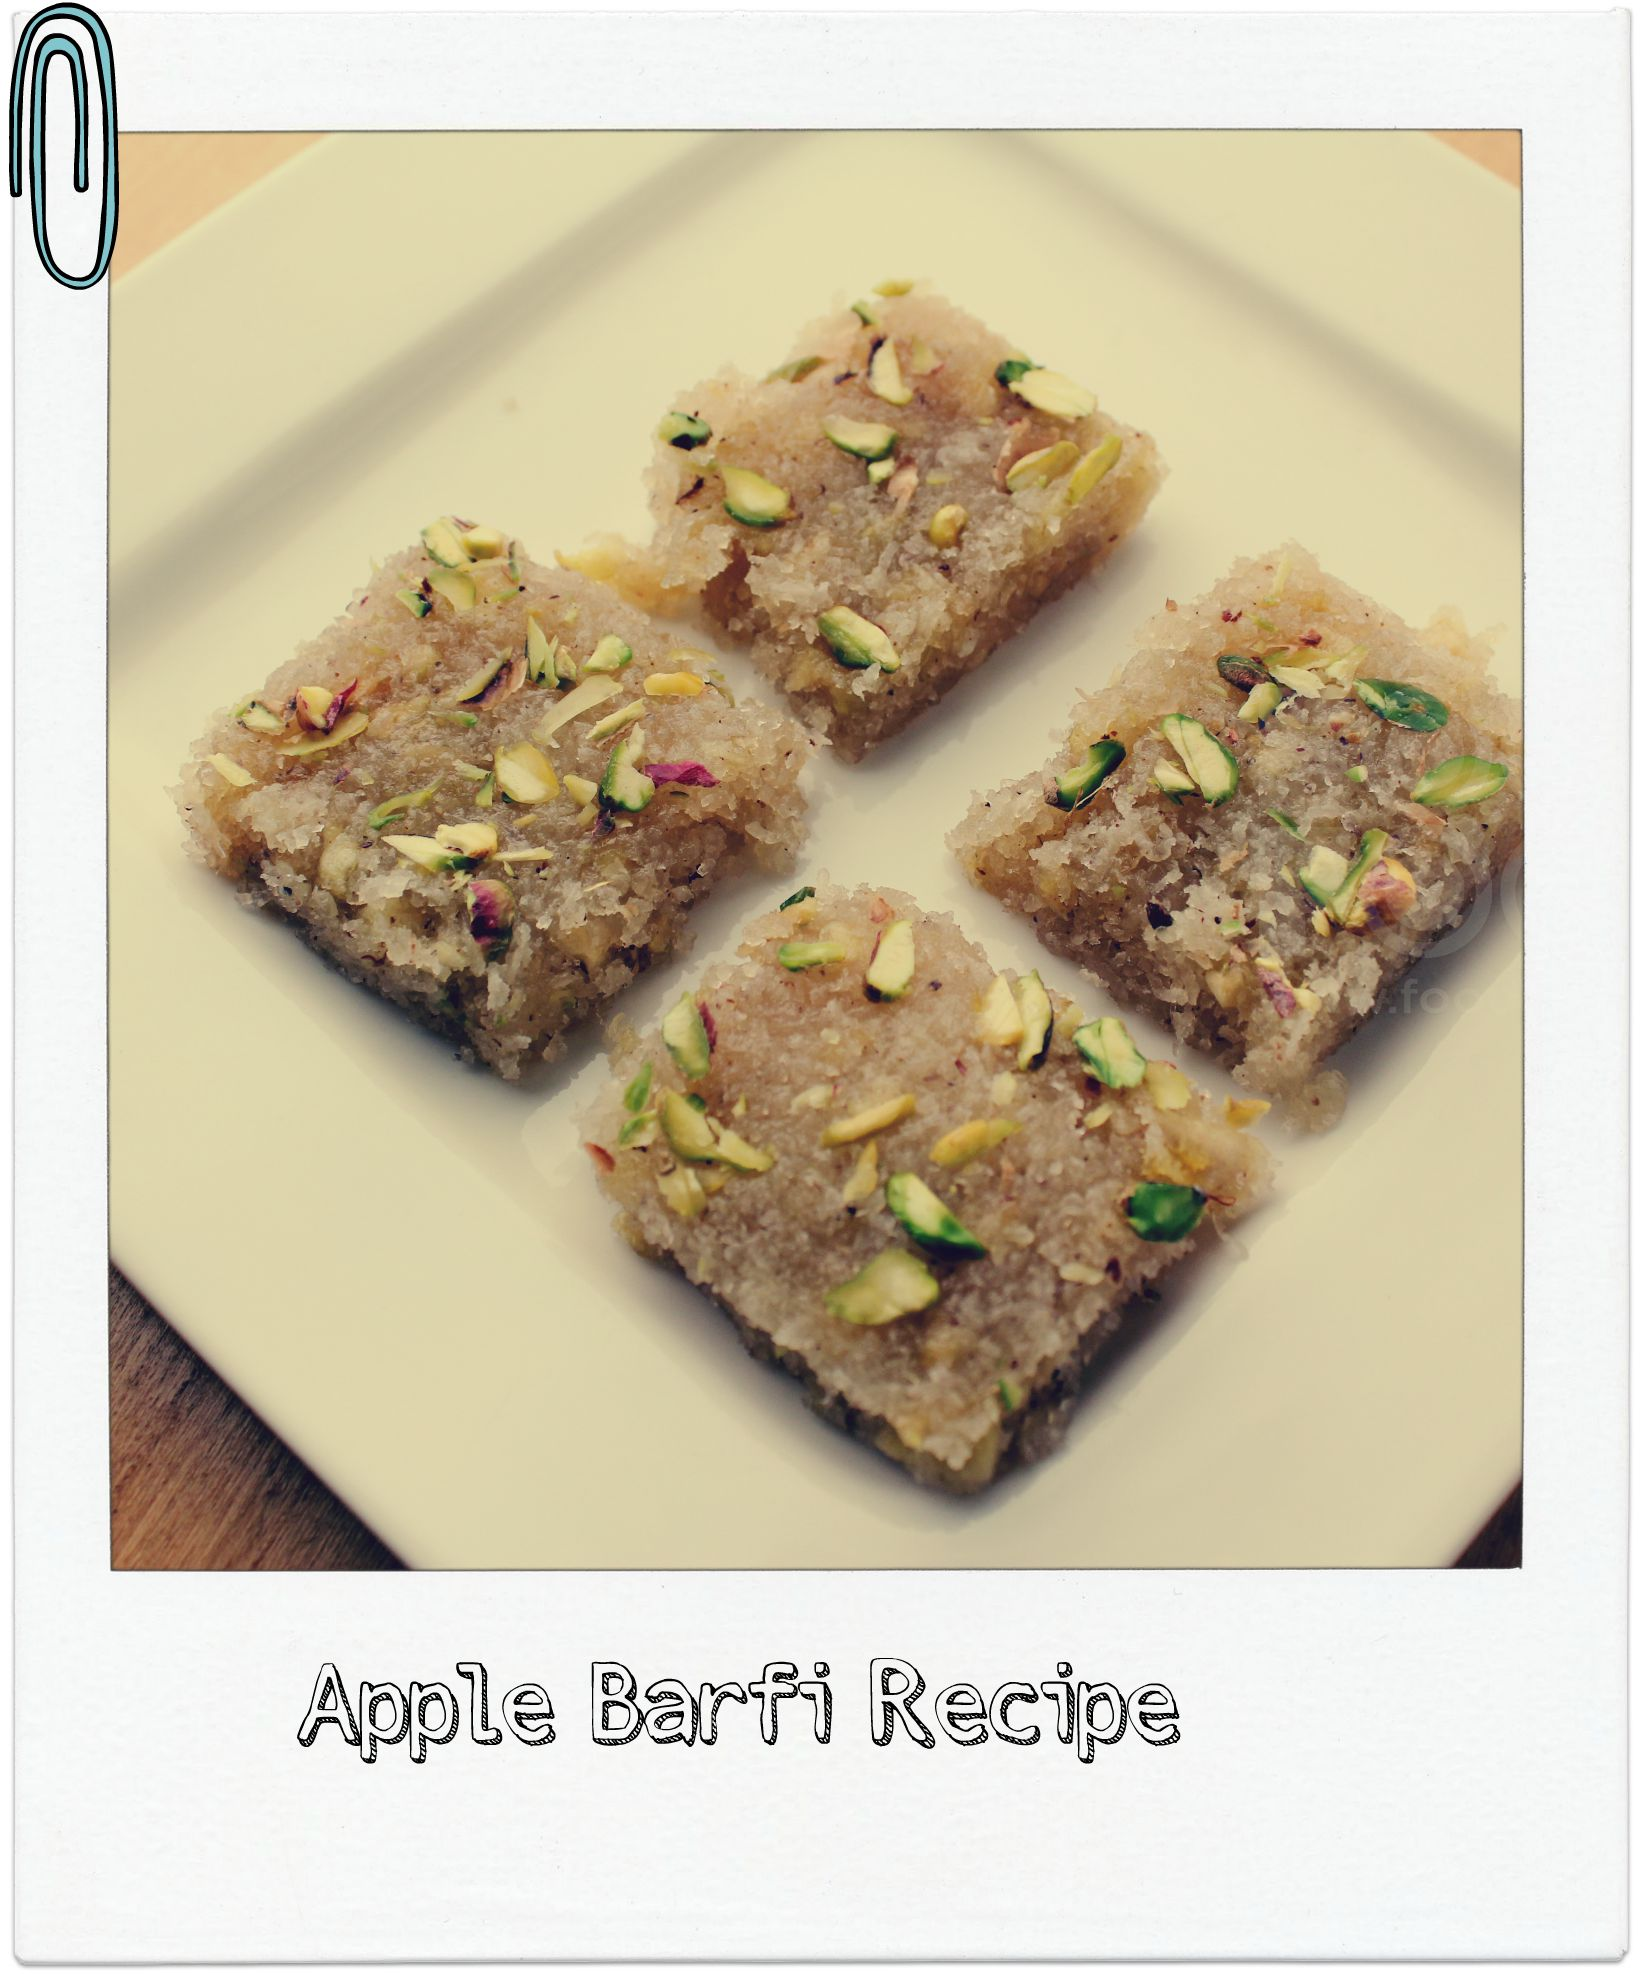 Apple Barfi recipe